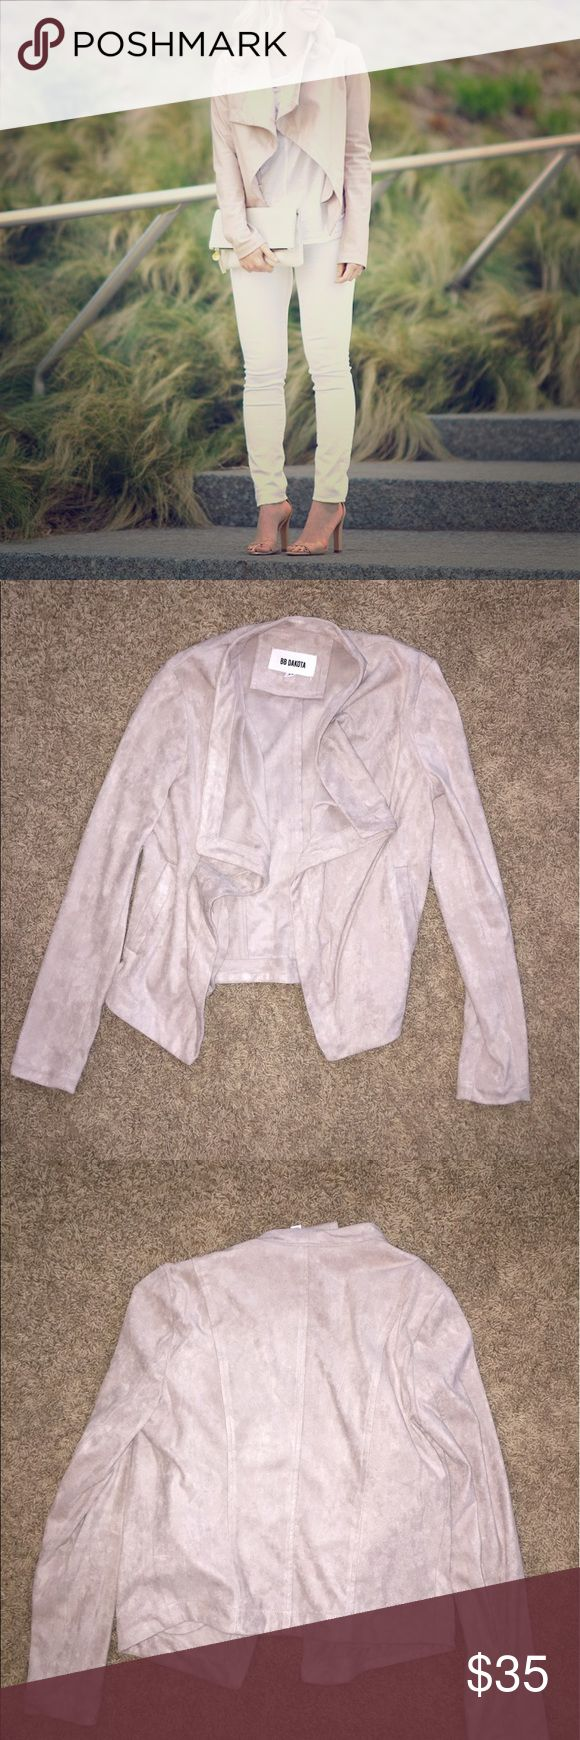 NWOT BB Dakota Blush Jacket NWOT BB Dakota Blush Jacket - Size XS - Color: Blush - Brand new, never worn BB Dakota Jackets & Coats